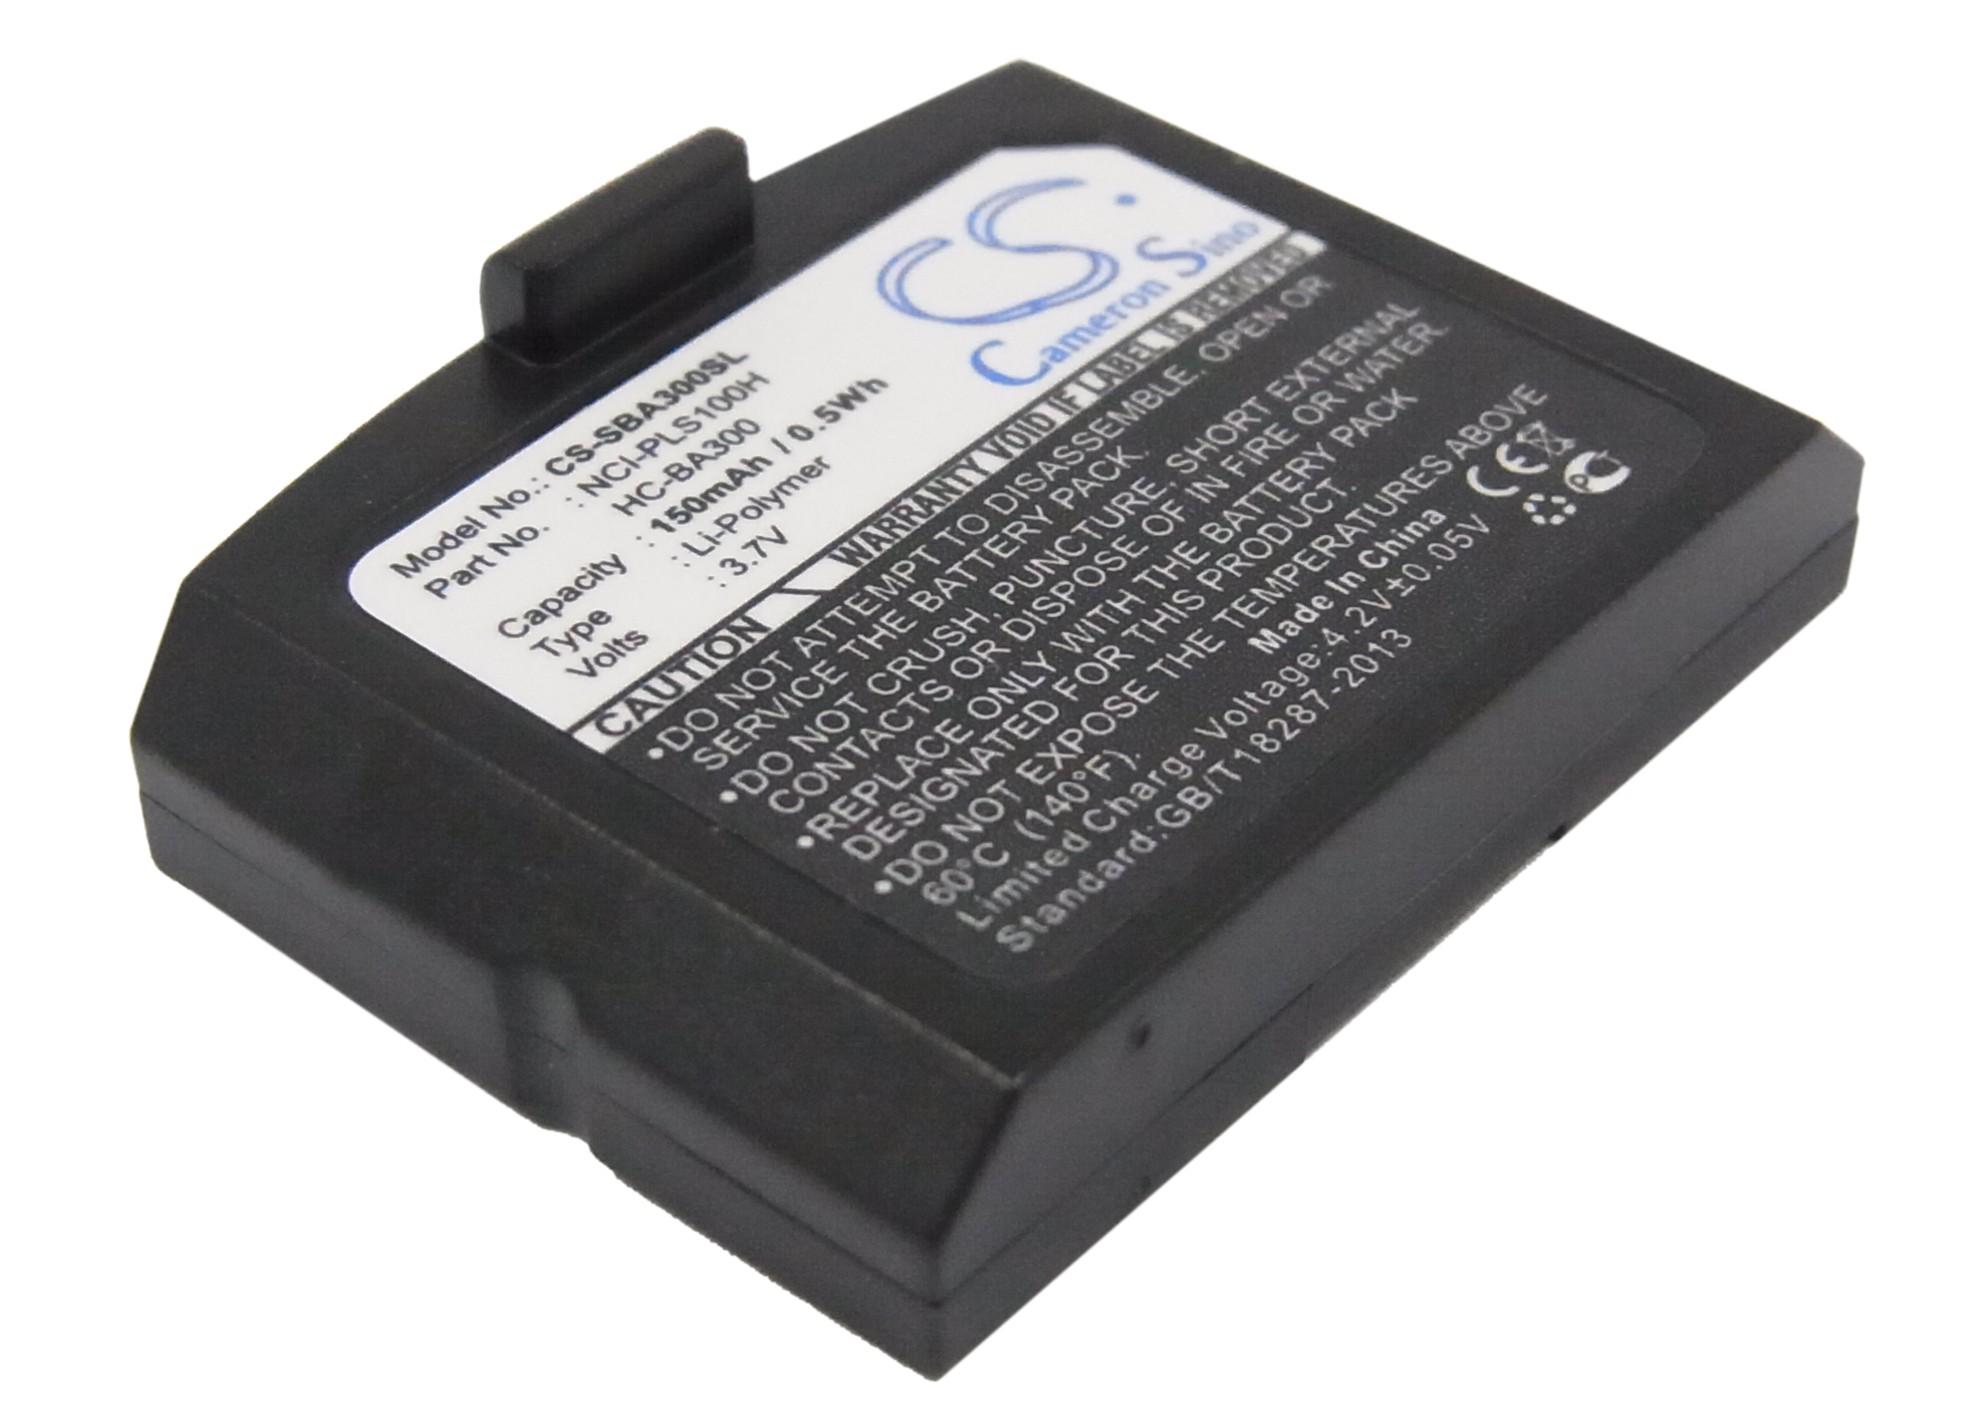 Cameron Sino baterie do bezdrátových sluchátek a headsetů pro SENNHEISER RS-4200 3.7V Li-Polymer 150mAh černá - neoriginální